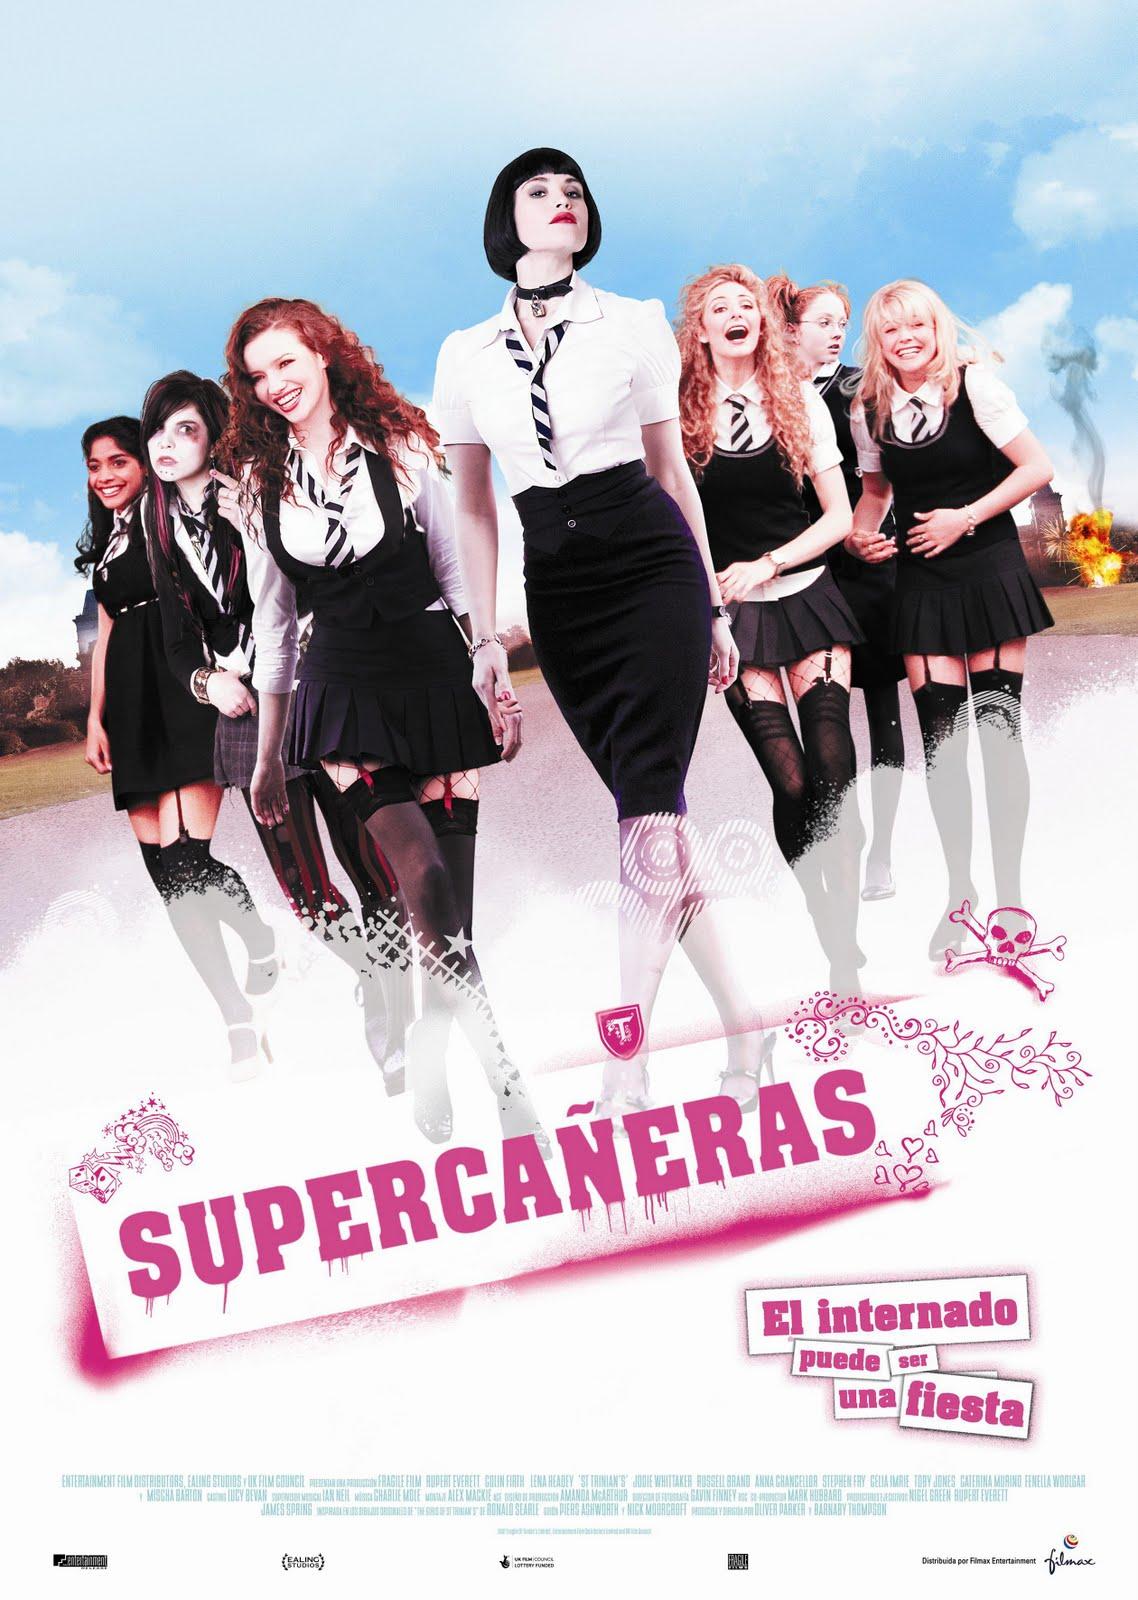 http://1.bp.blogspot.com/_EpR3ptvILug/TJEKt2eybiI/AAAAAAAAAZU/dBxE_dUOngg/s1600/archivos_imagenes_carteles_s_Supercanieras-StTrinians-tt0964587-2007-es.jpg